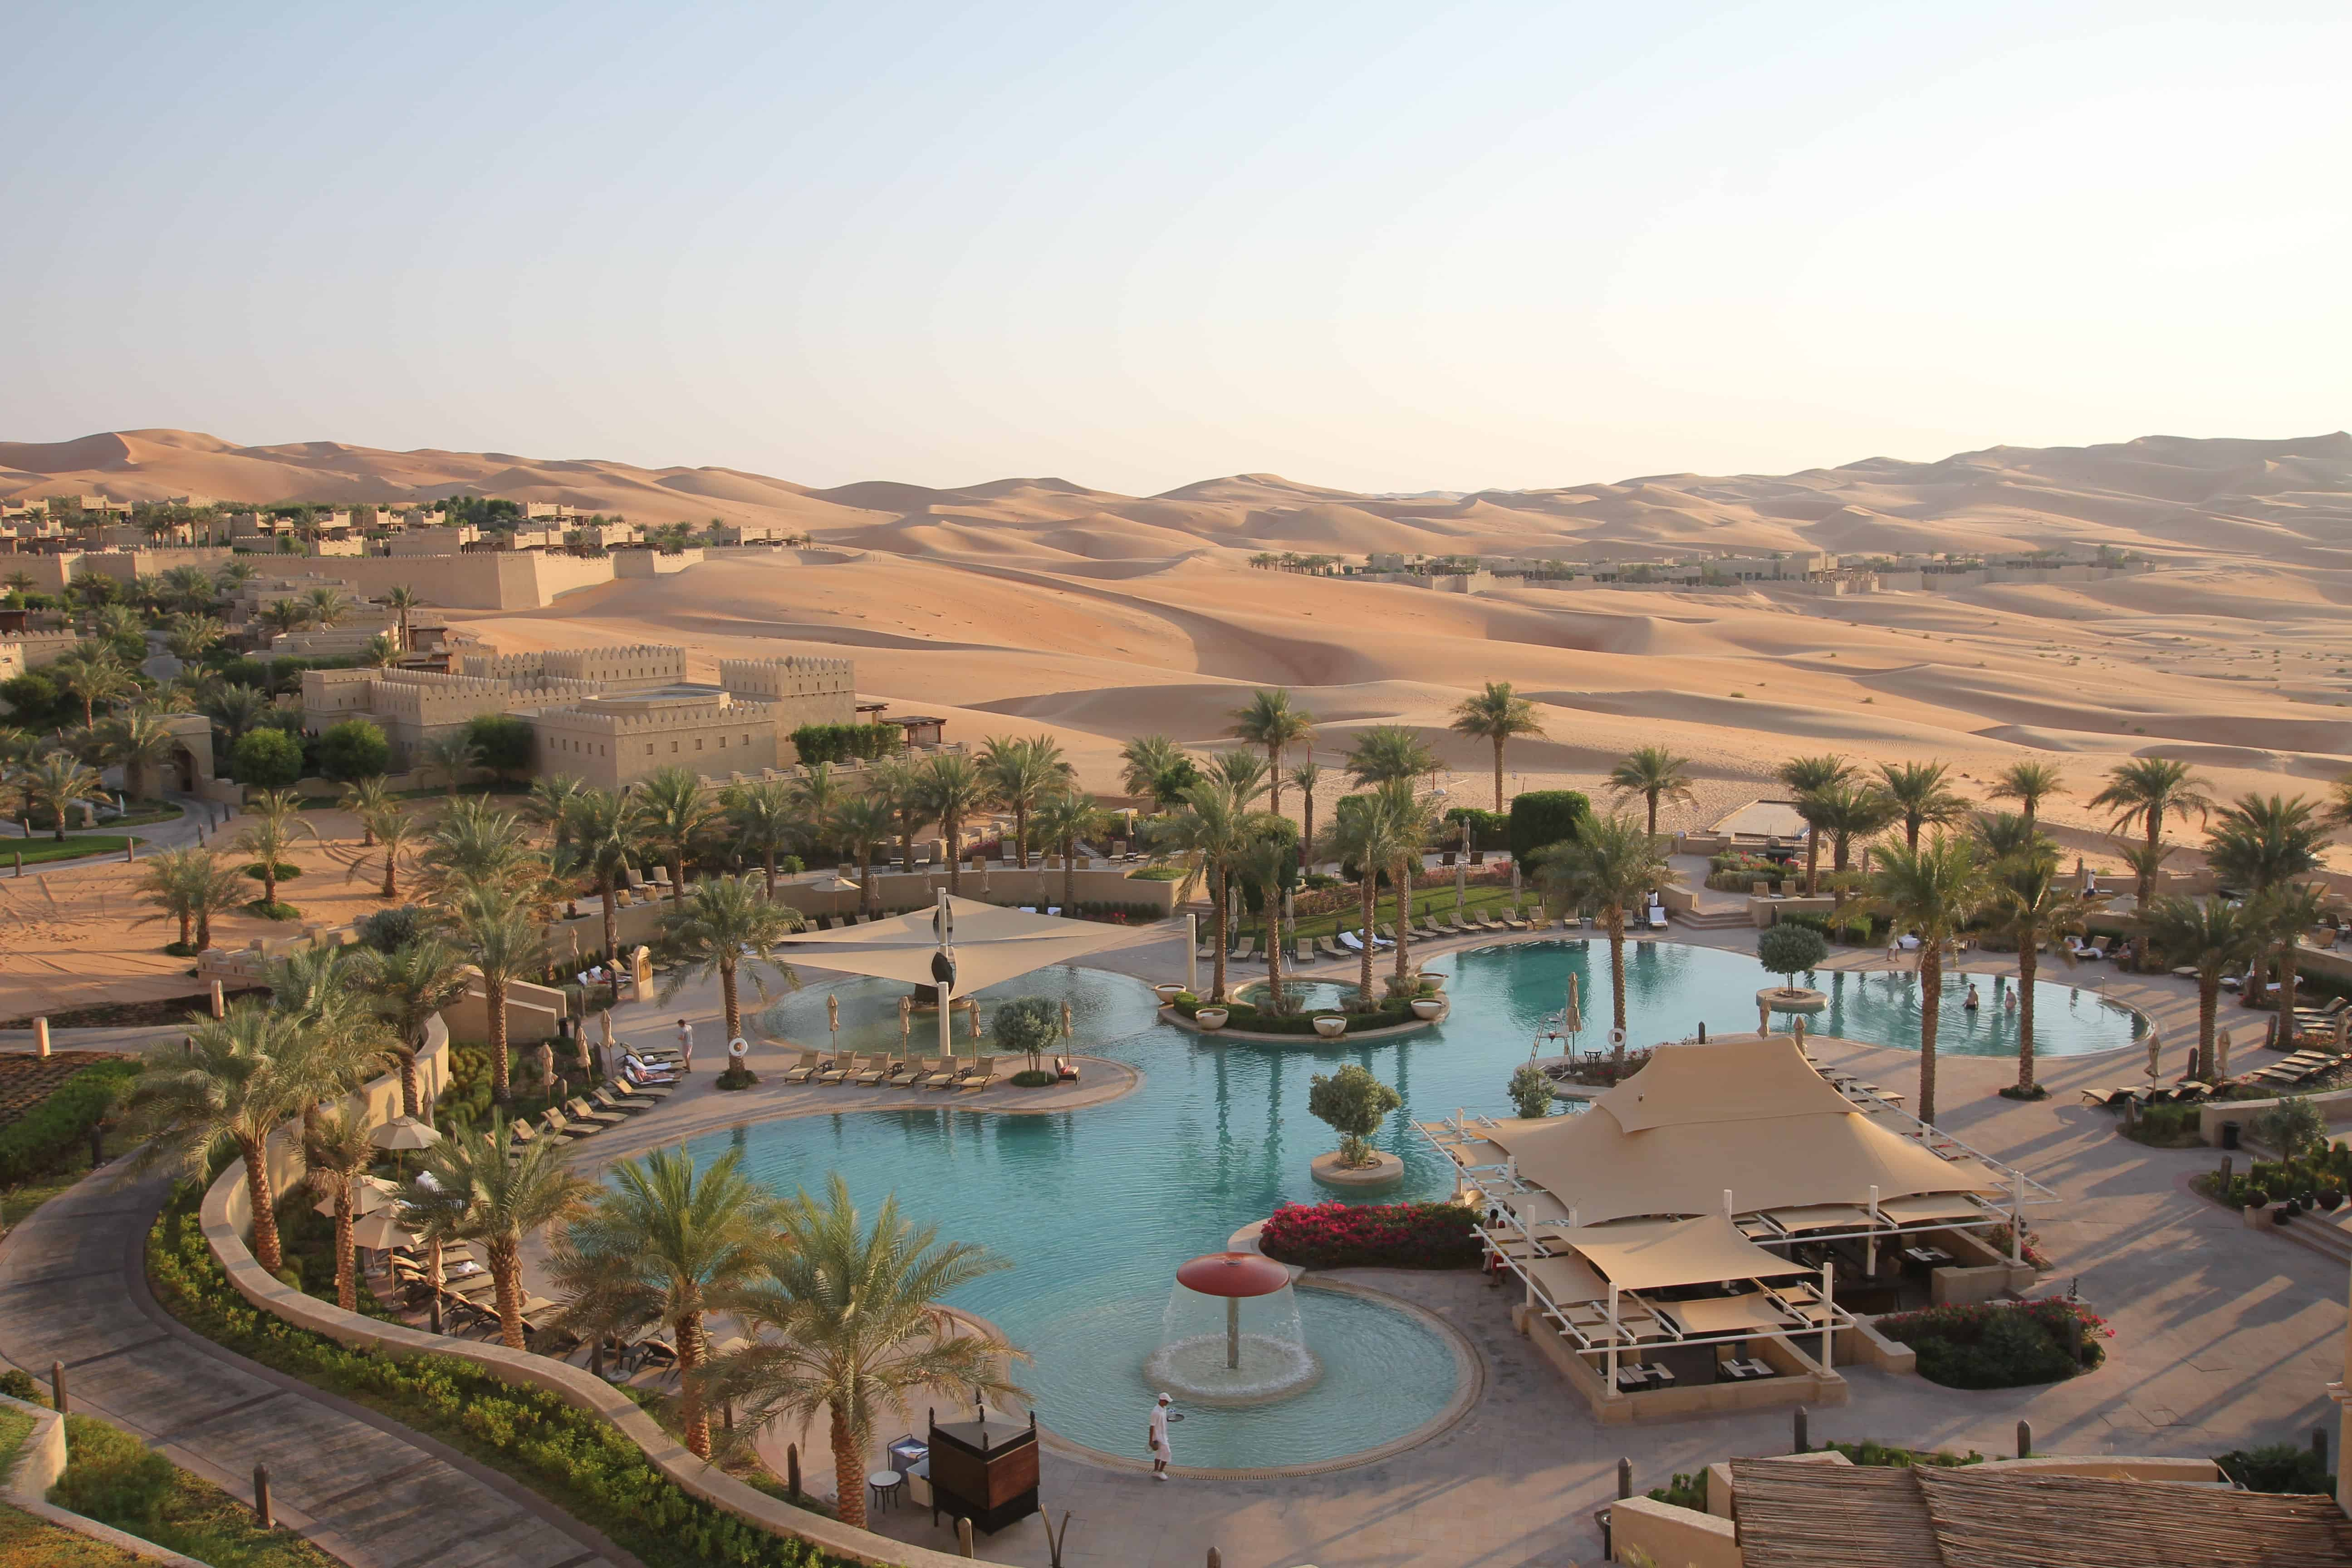 Al_Sarab_Desert_Resort